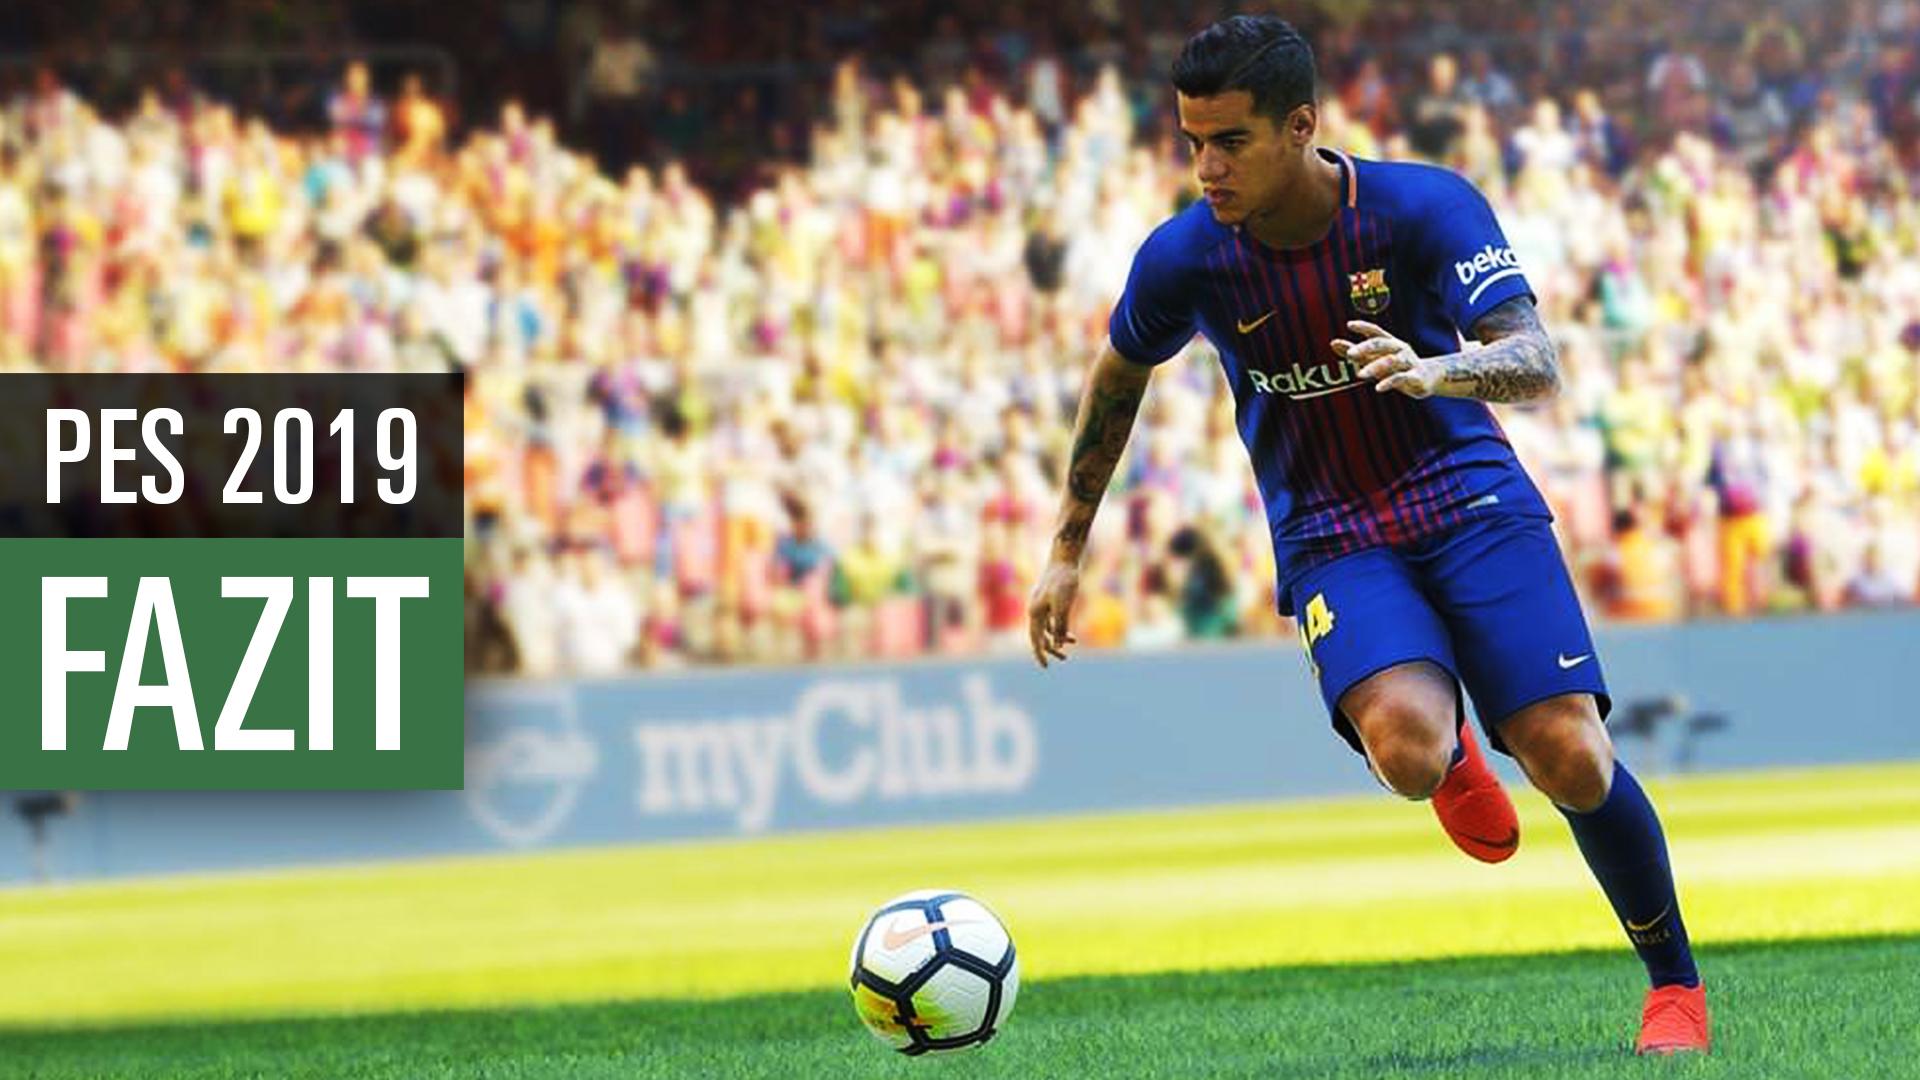 PES 2019  Auf der E3 angespielt - besser als FIFA 19  83b792445d8e4